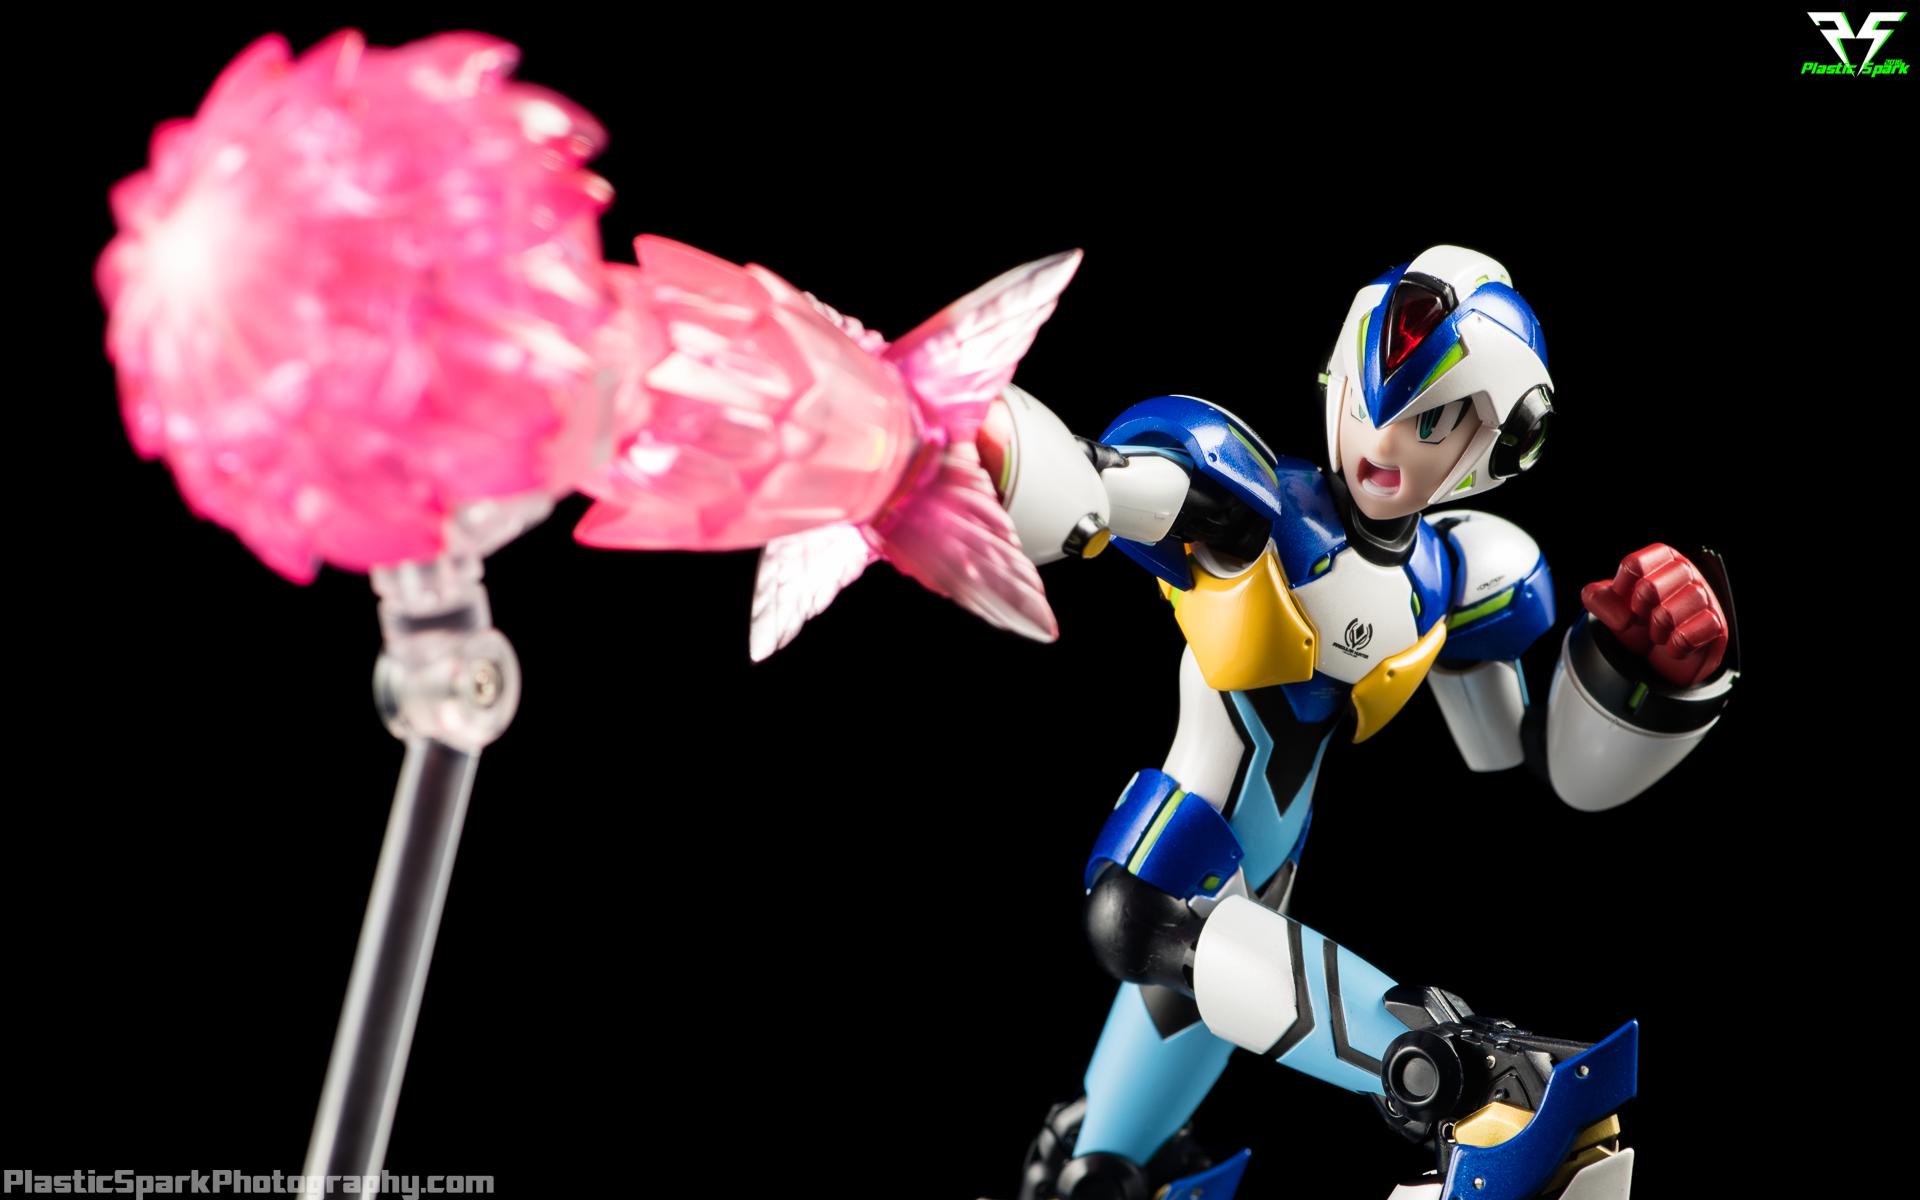 Truforce-Megaman-X-Boost-(13-of-17).png